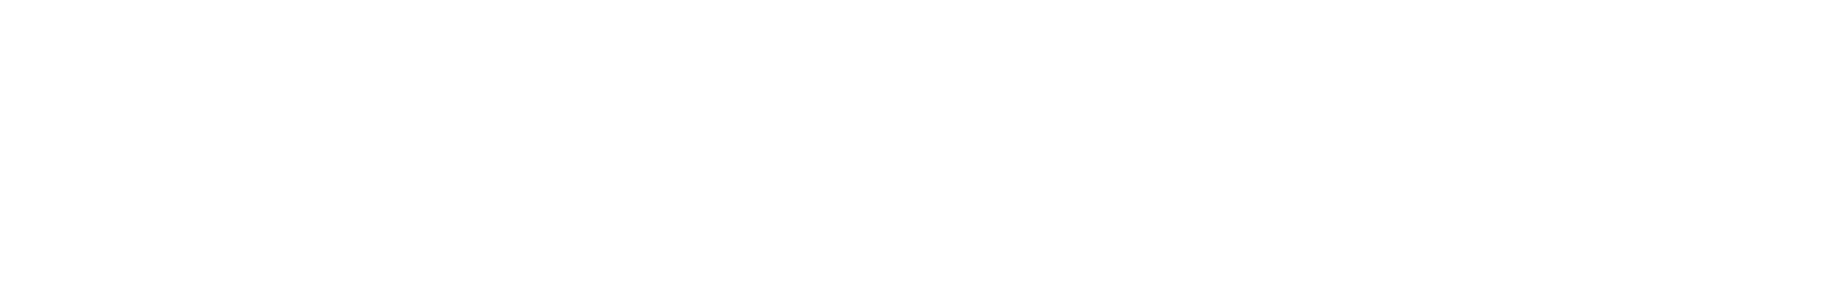 Festivaali-logo